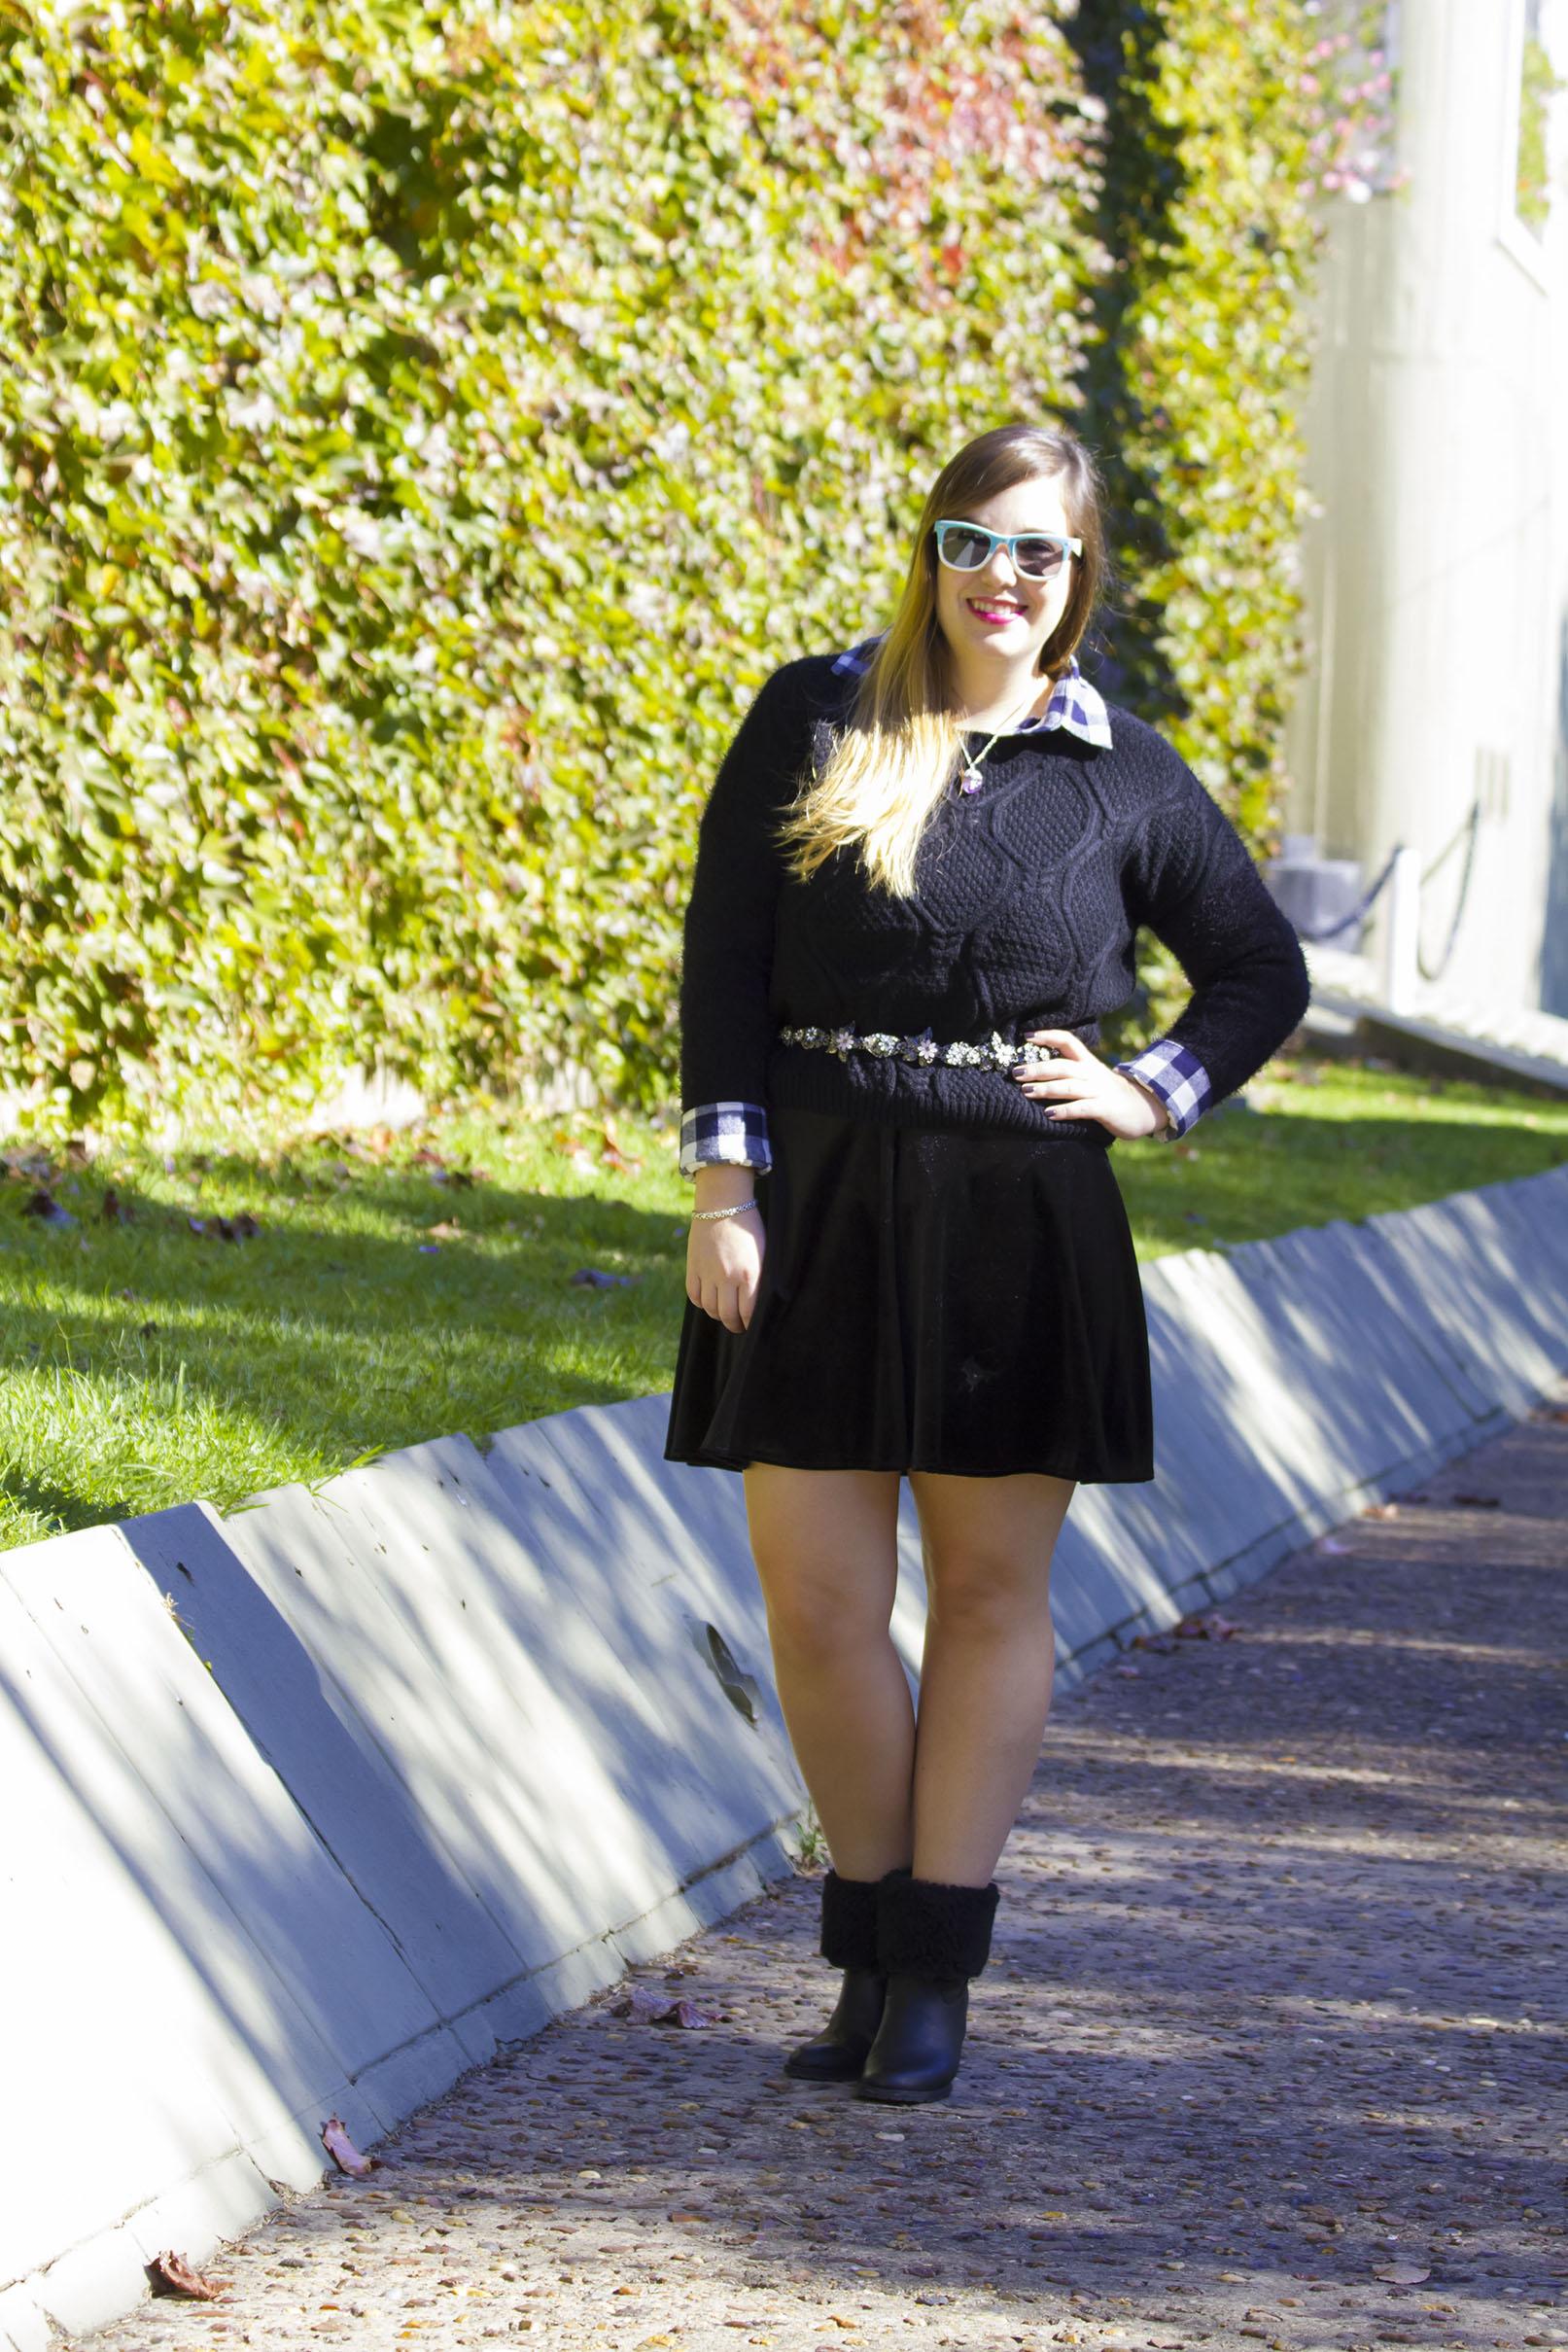 Get the look: Camisa a cuadros, Koxis. Cinturón de flores, Zara. Falda, Complot. Sweater, Koxis. Botitas, Viamo. Collar, Mas Negro. Gafas, Infinit.